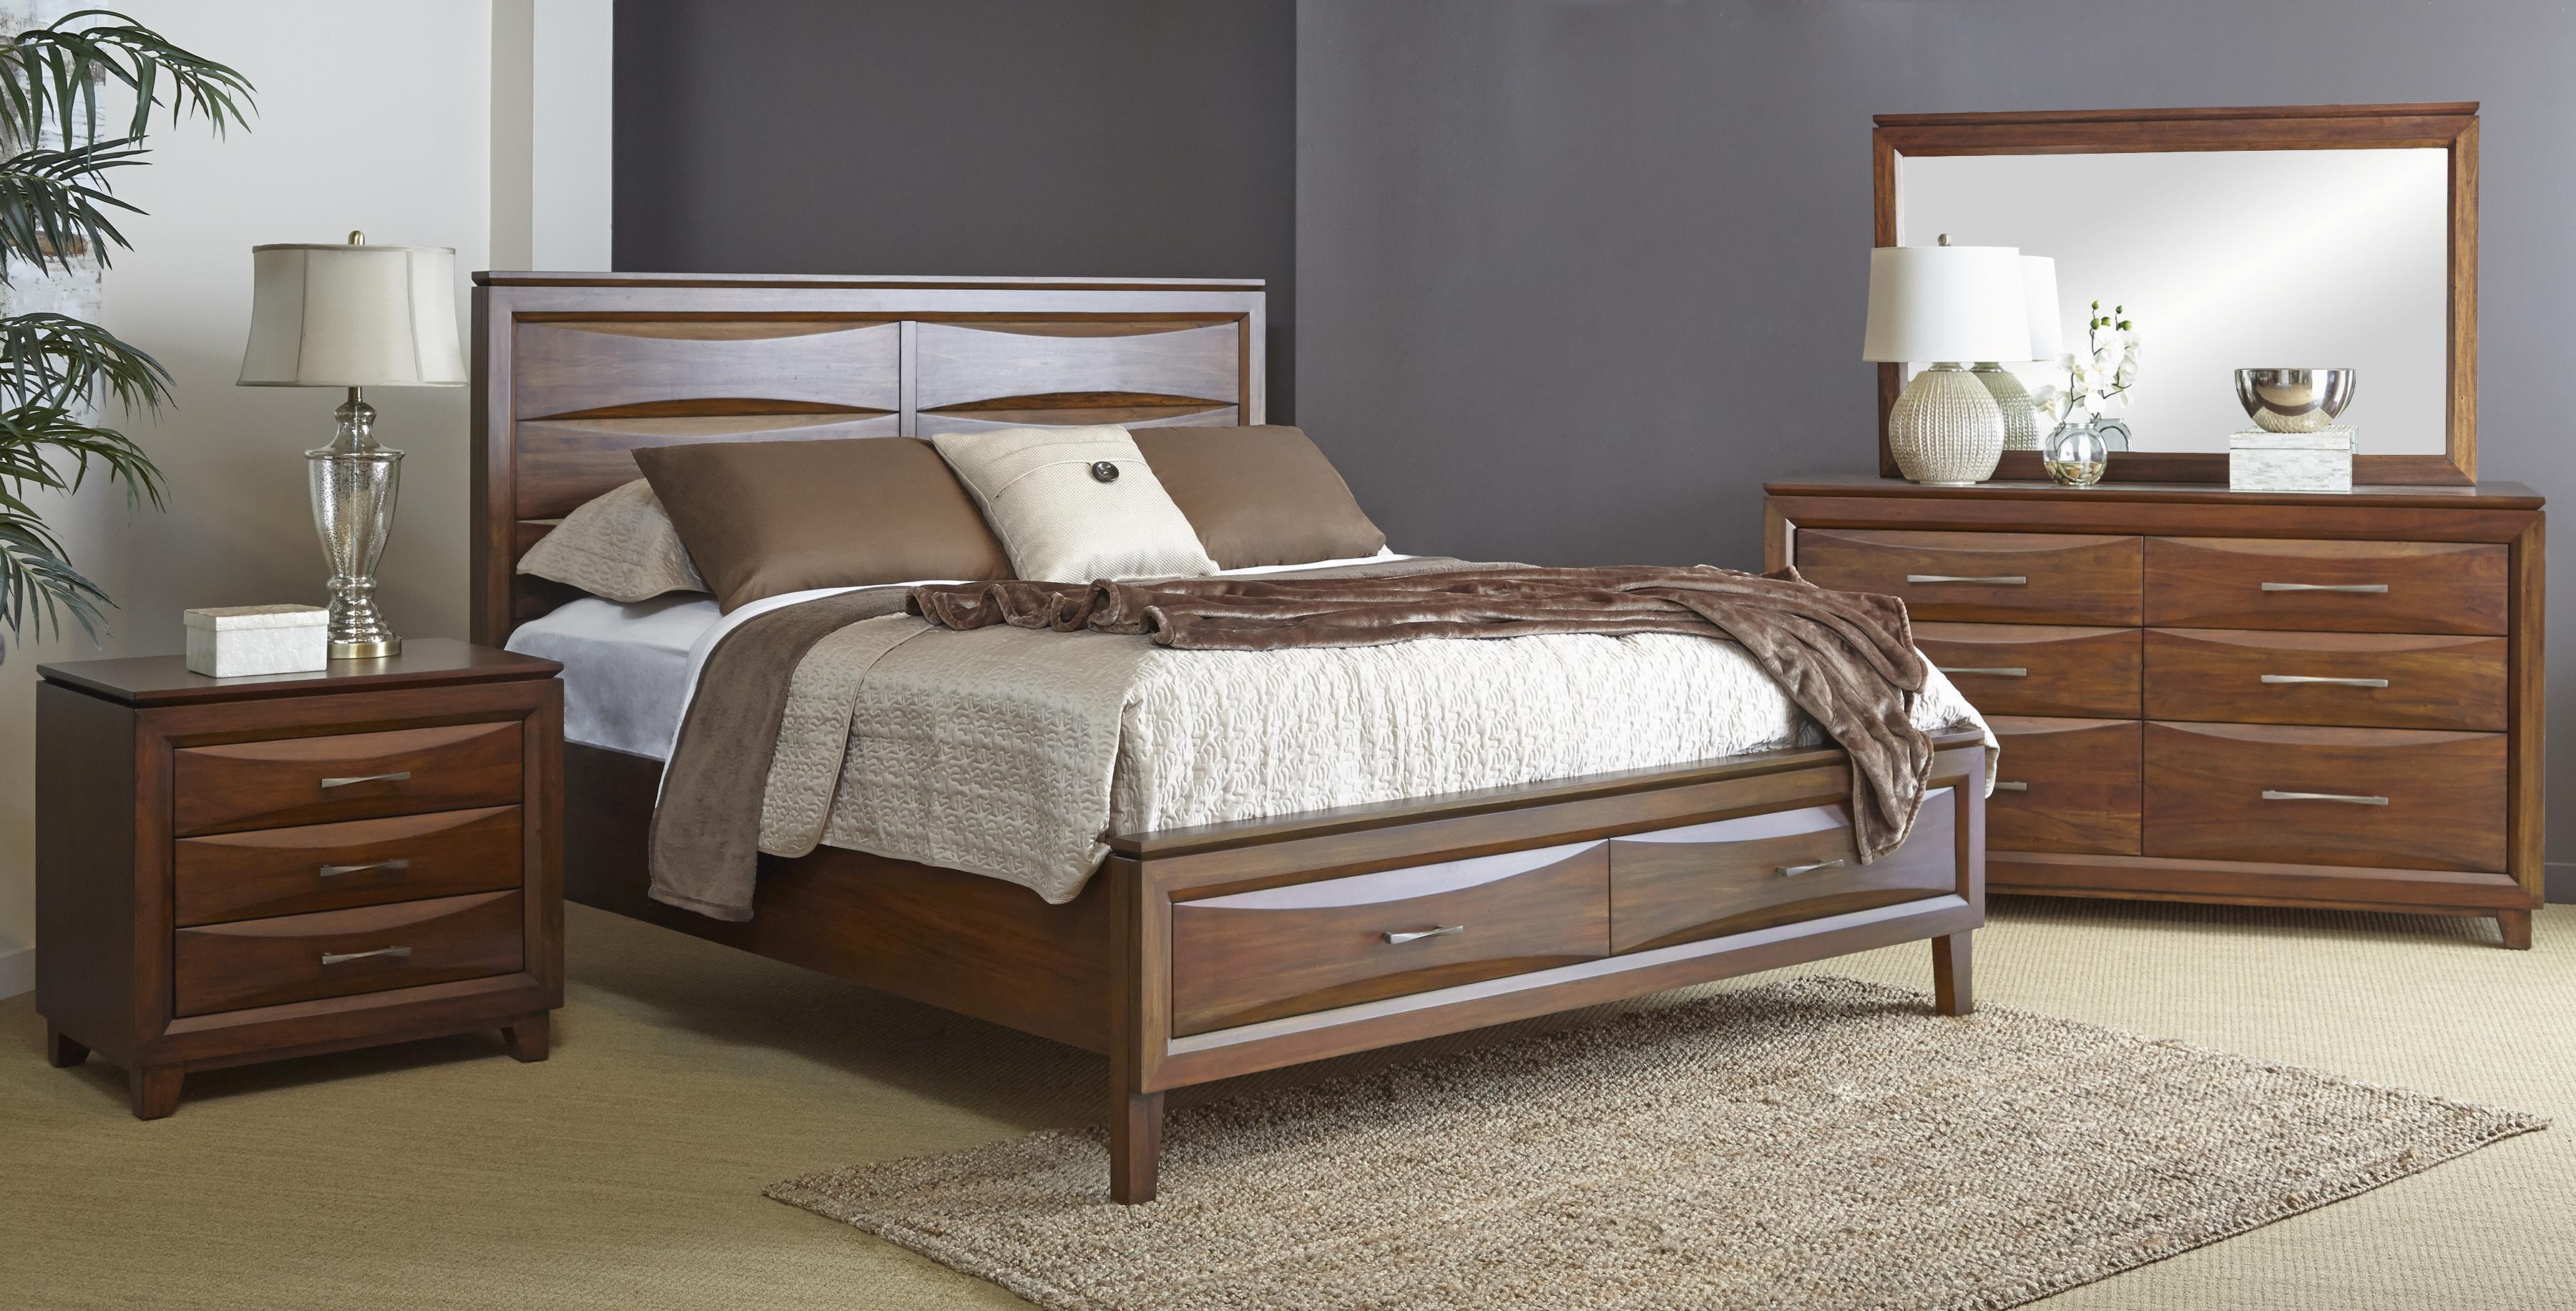 Riviera King Bedroom Group by Napa Furniture Designs at Fashion Furniture